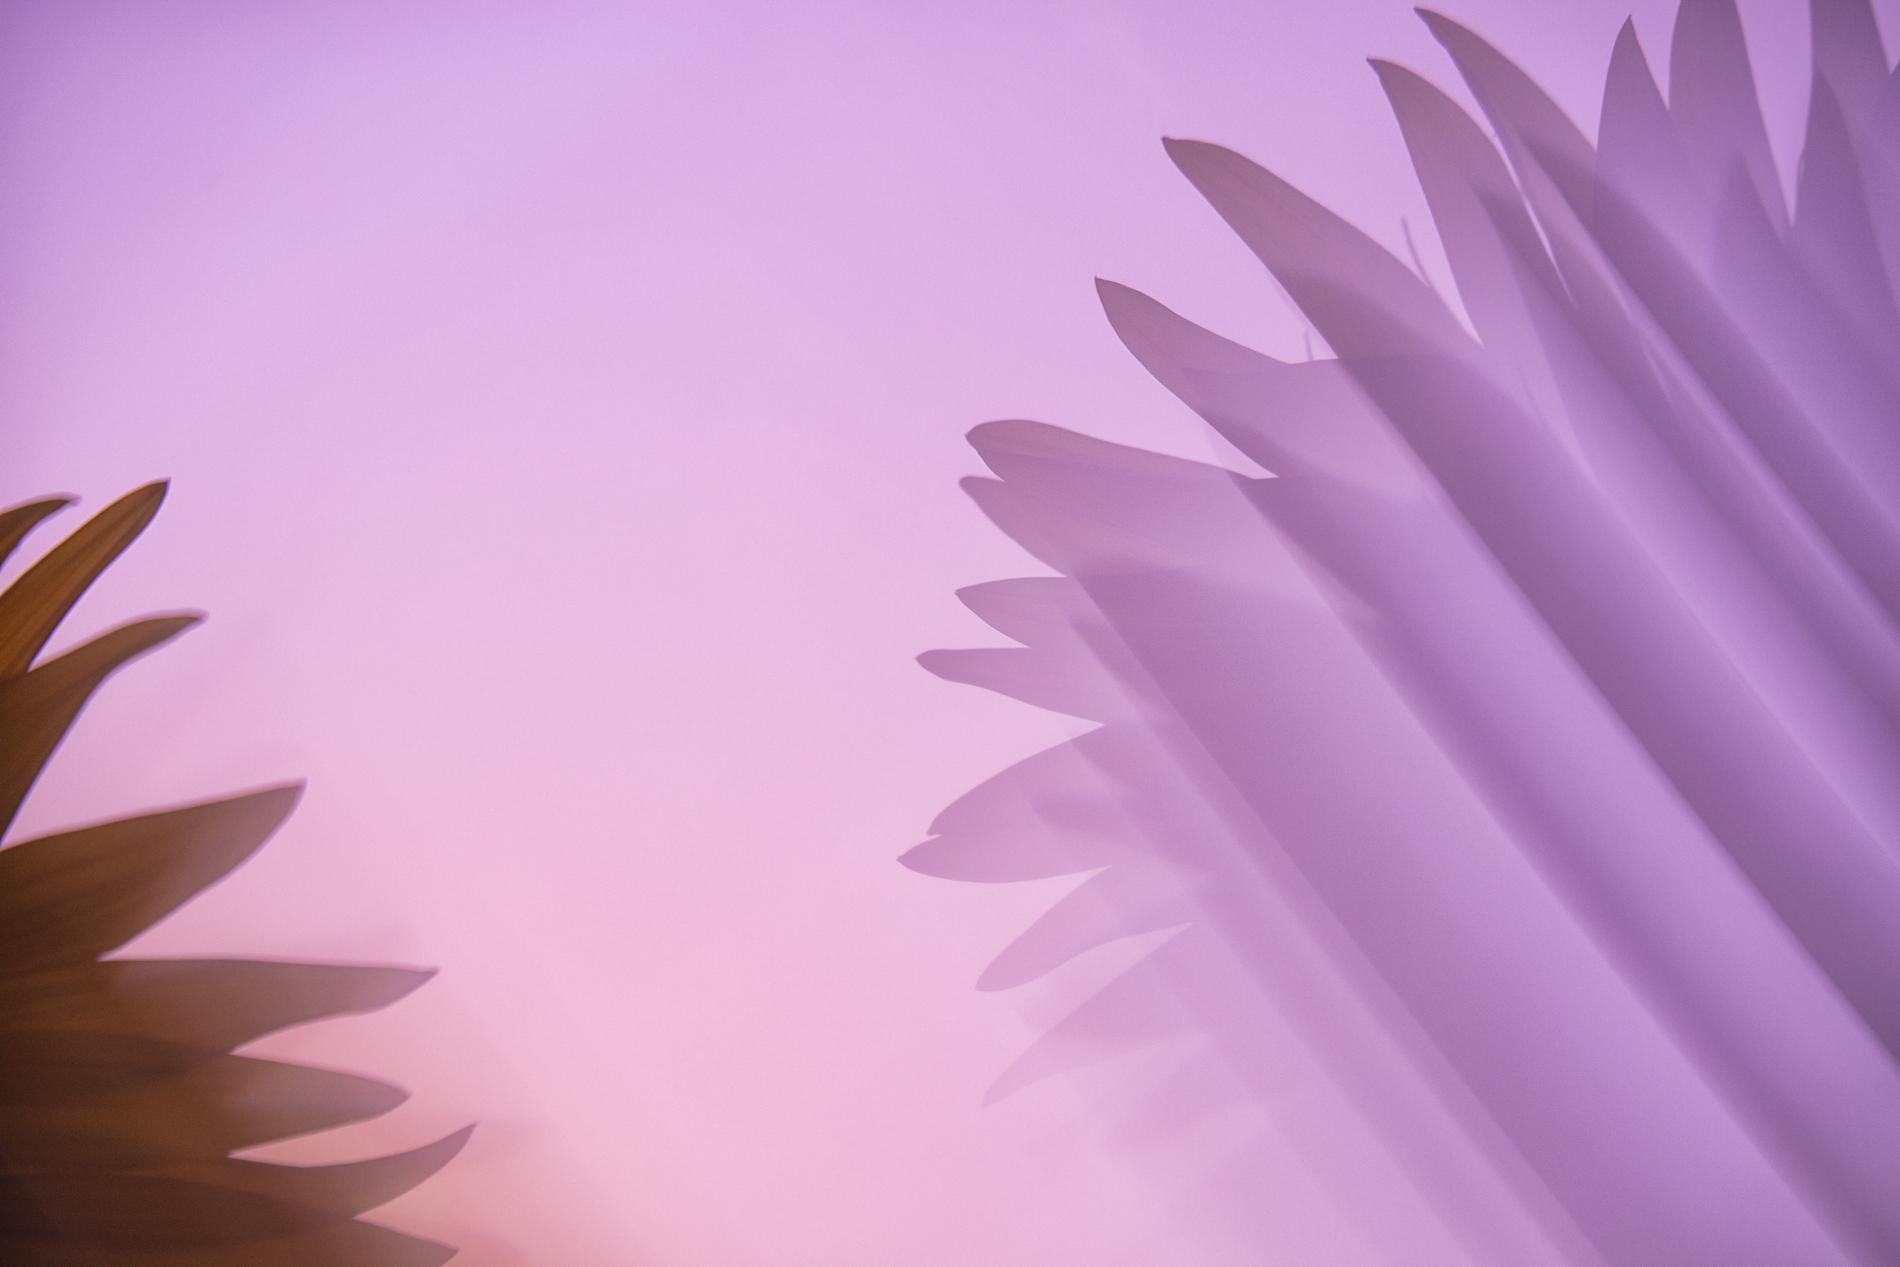 GIRASOLES - David Santiago, Landscape Photography